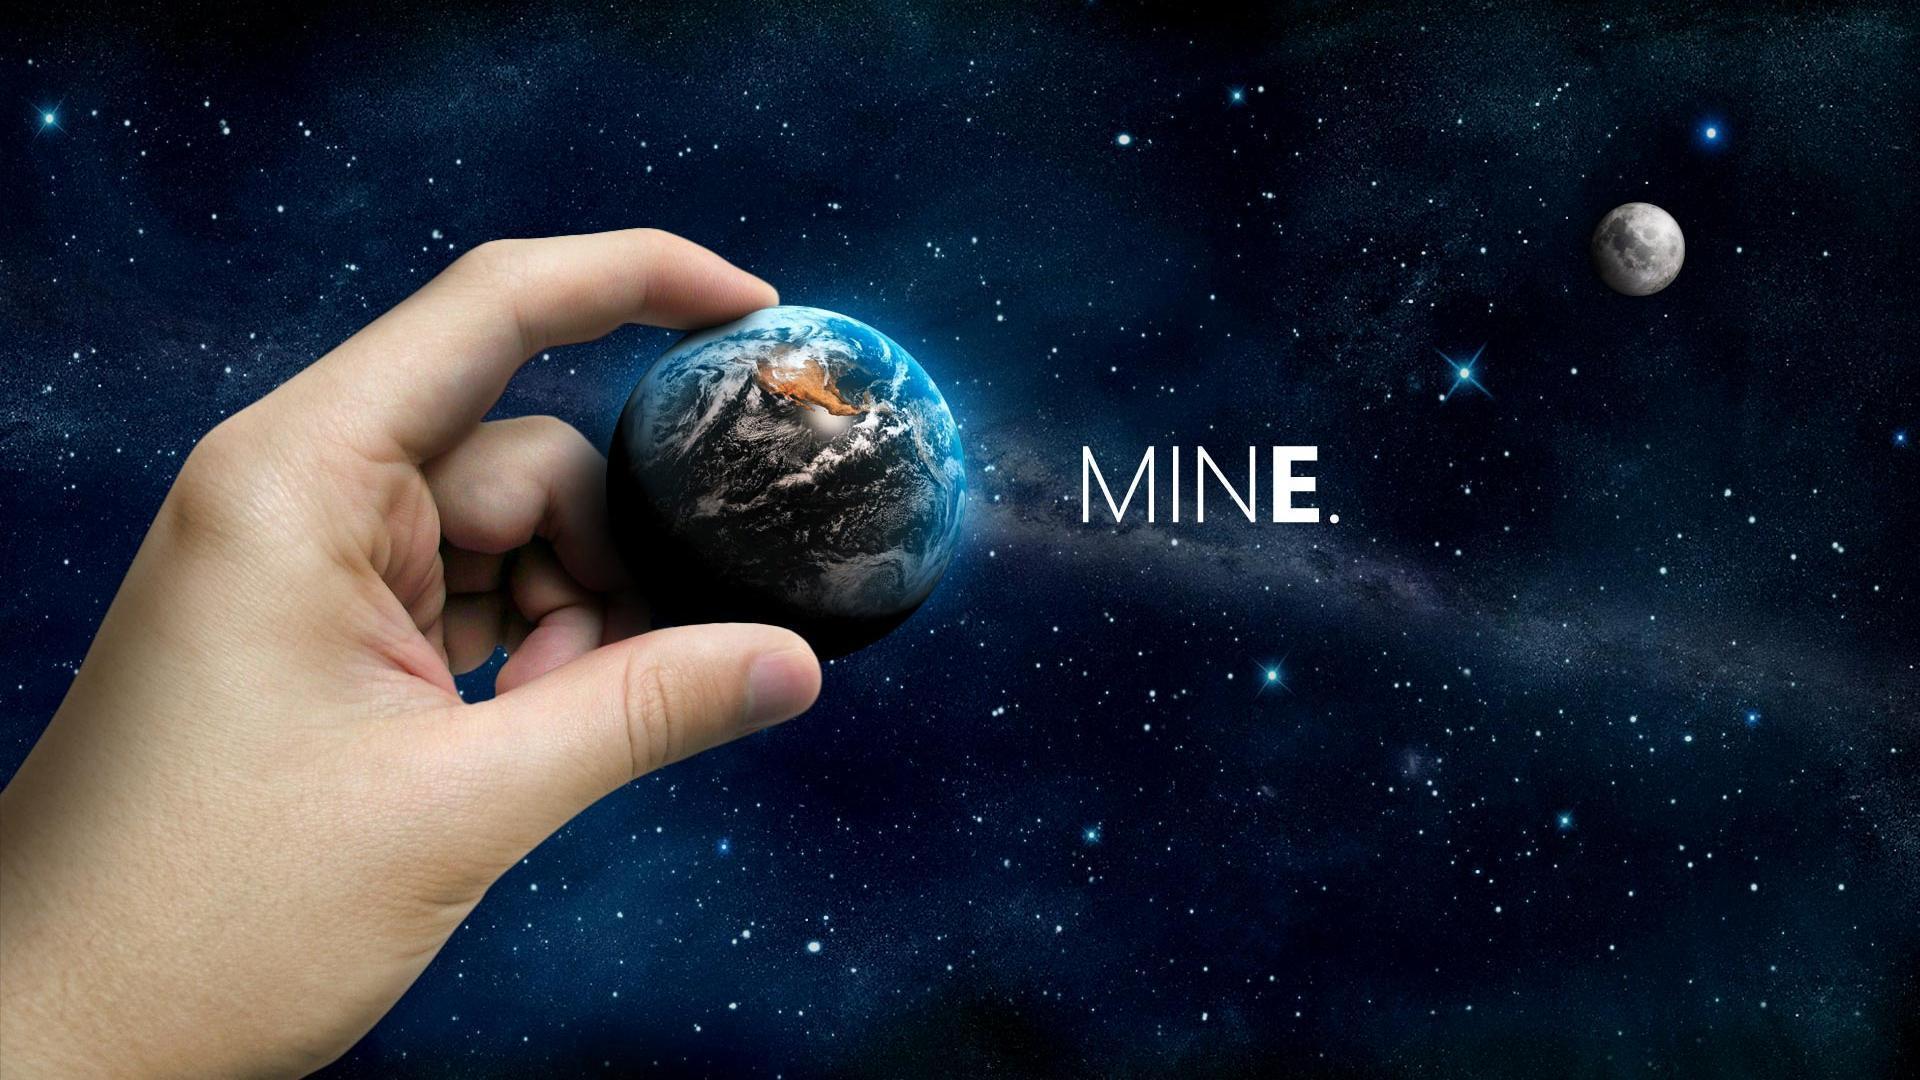 universe 8 planets quote - photo #33